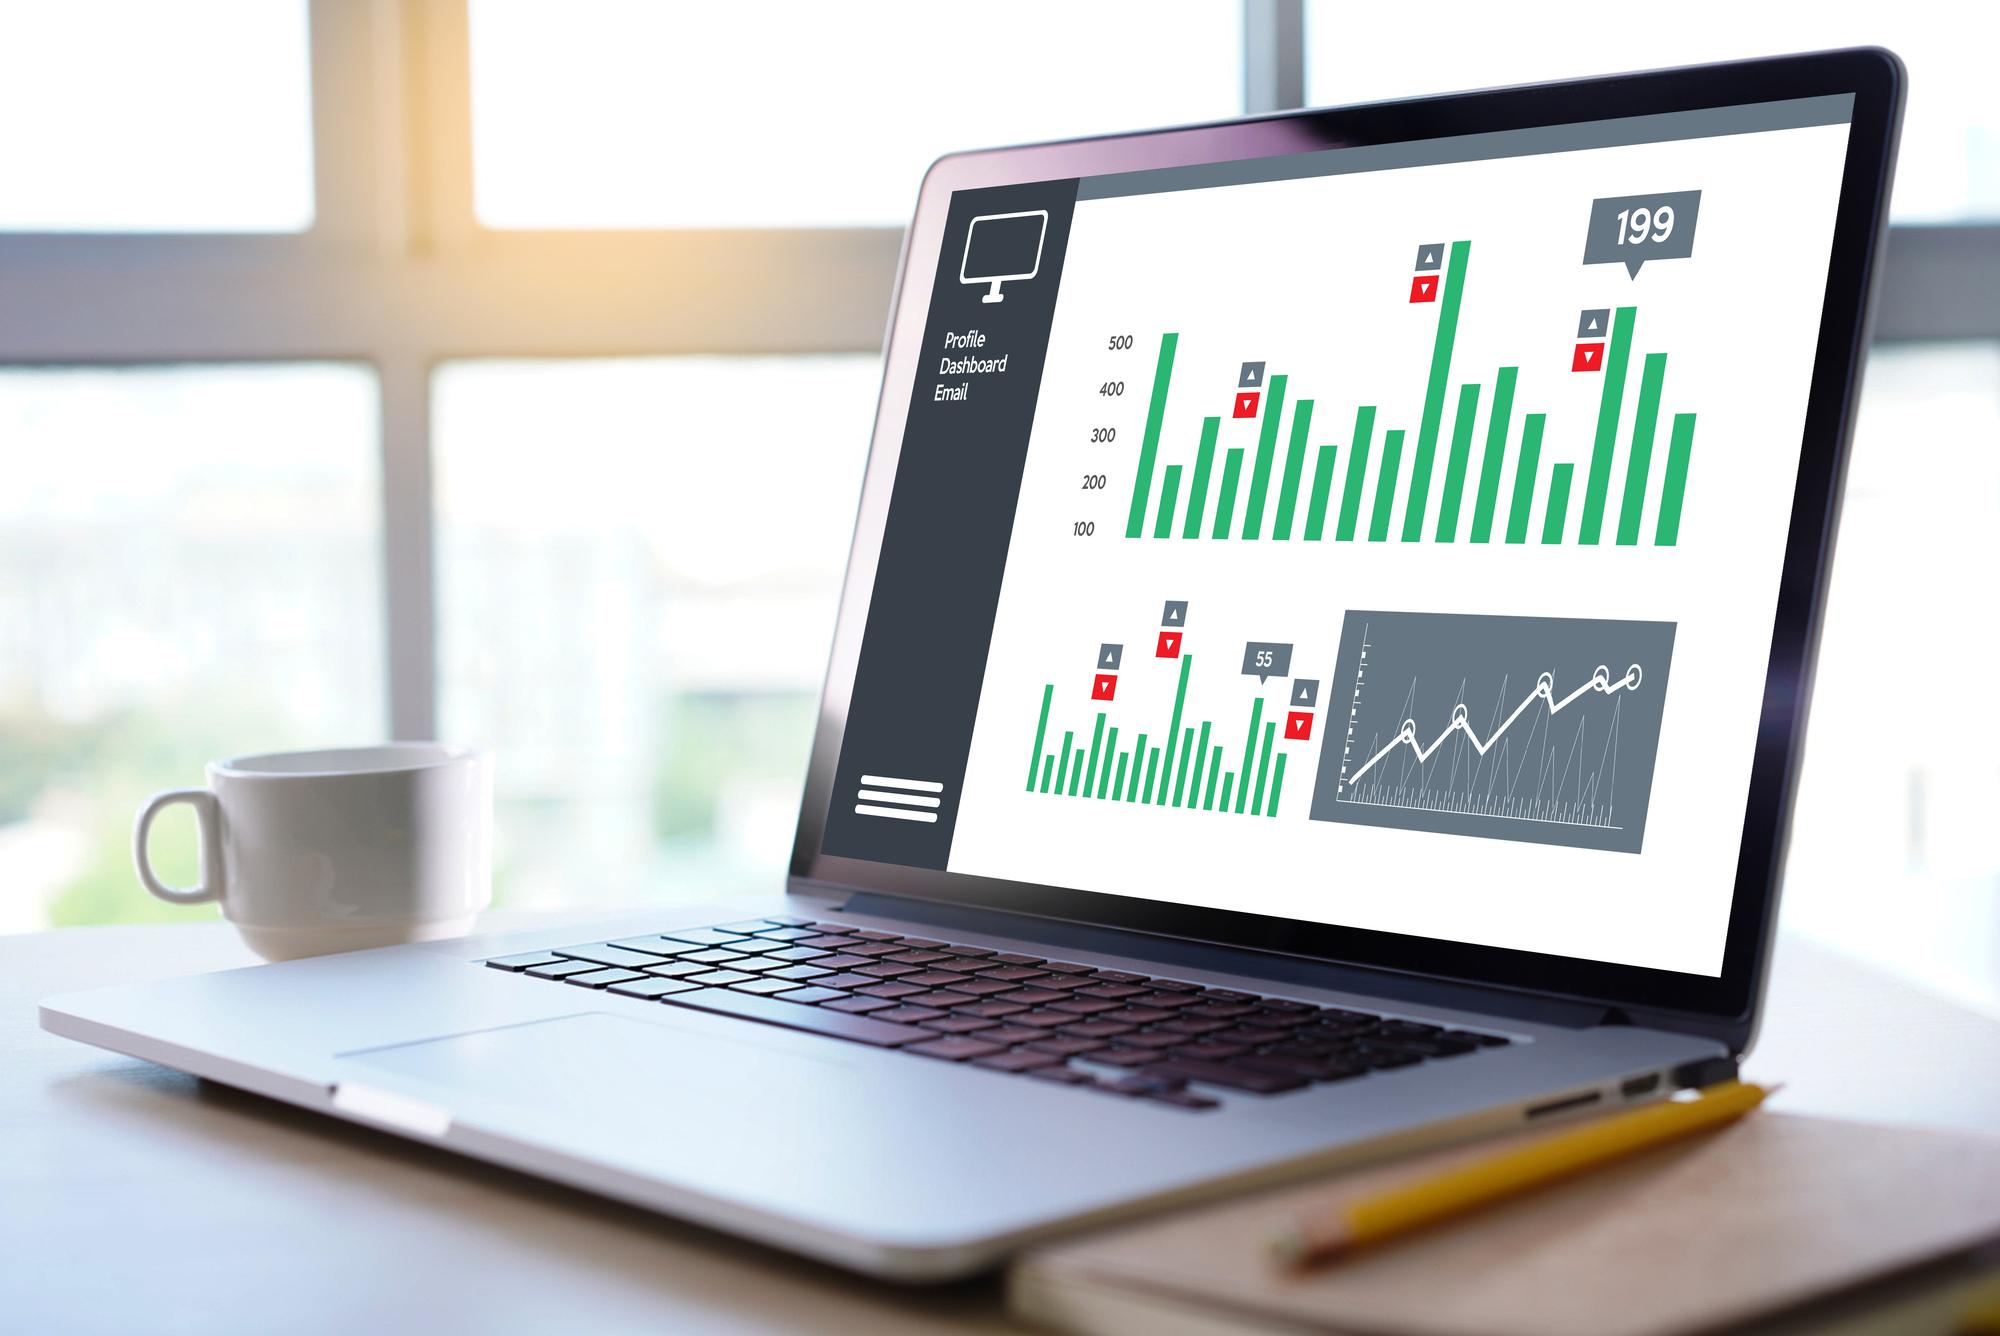 Googleアナリティクスの結果を元に分析を行うマーケティング機能は、専用の管理画面を用意。